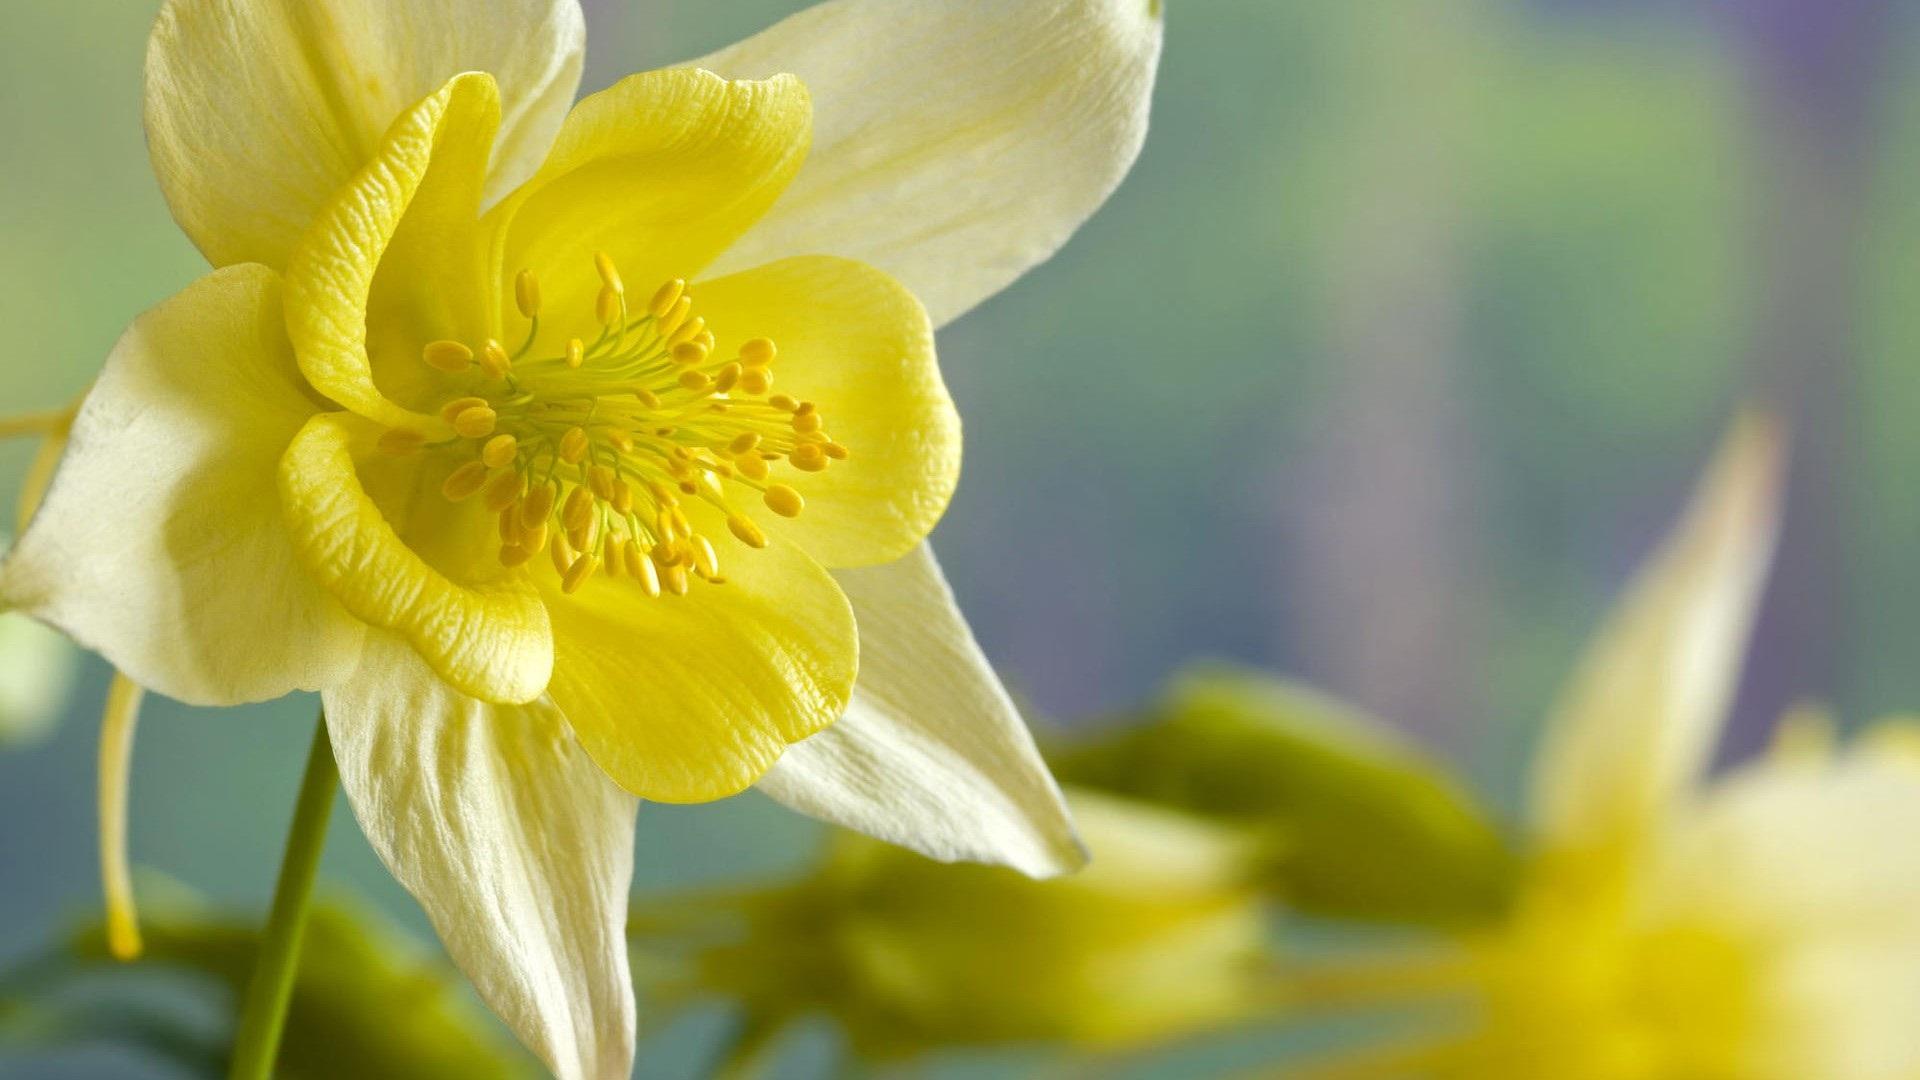 download daffodils 1920x1080 wallpaper - photo #16